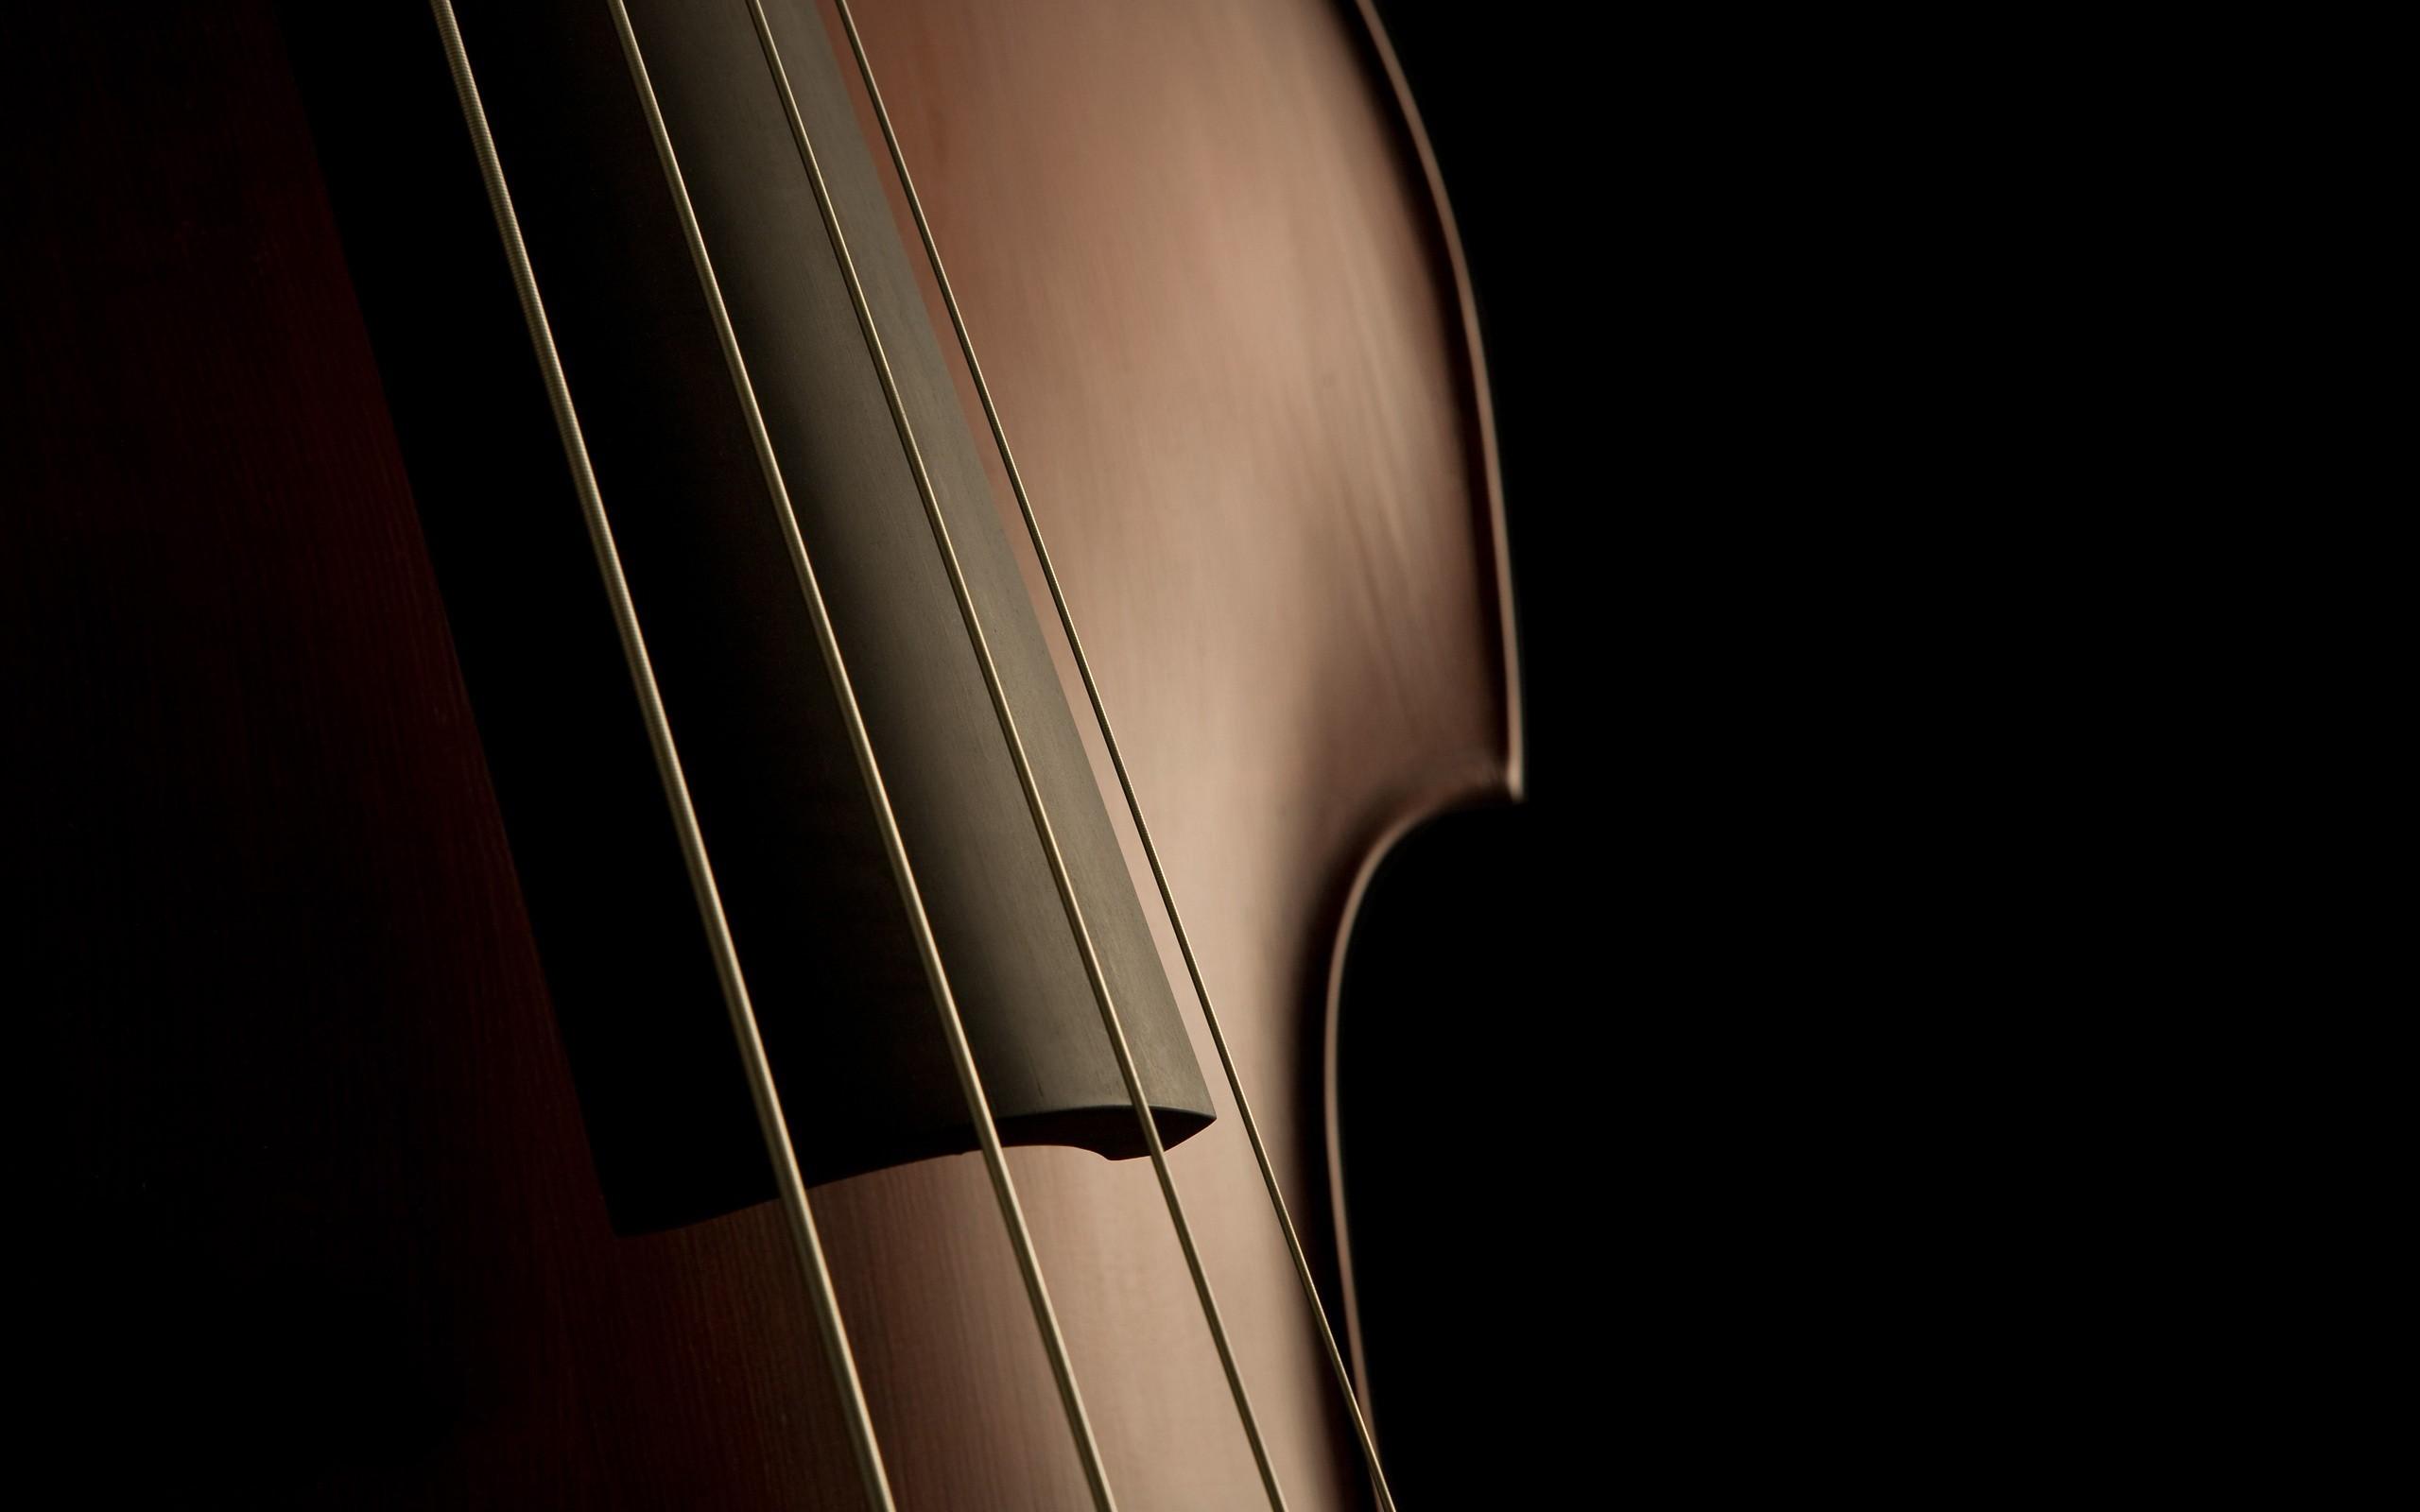 Violin Wallpaper: Violins Cello Wallpaper